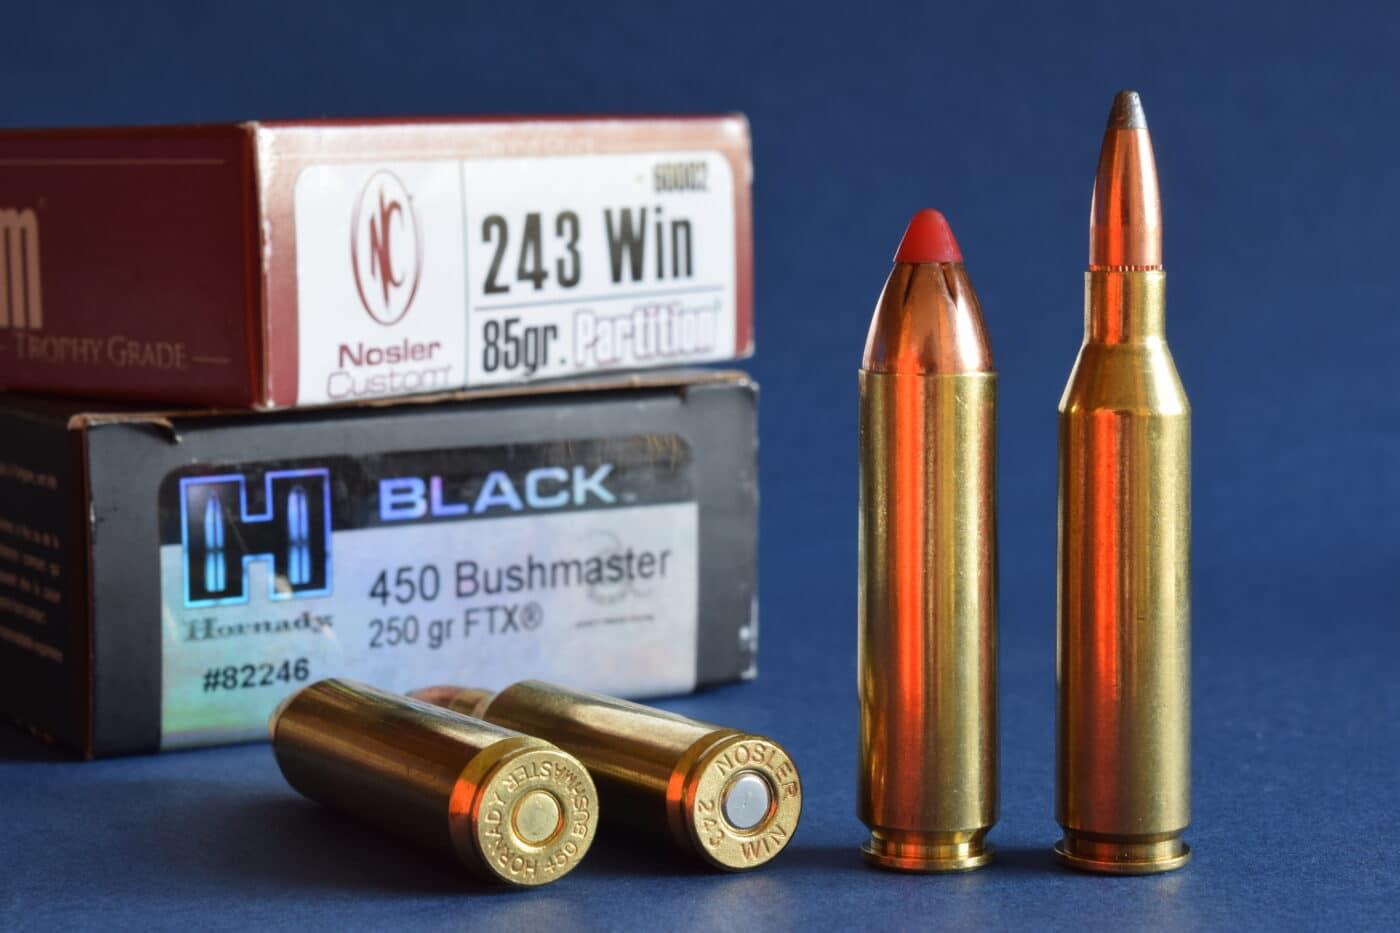 .450 Bushmaster vs. 243 ammunition